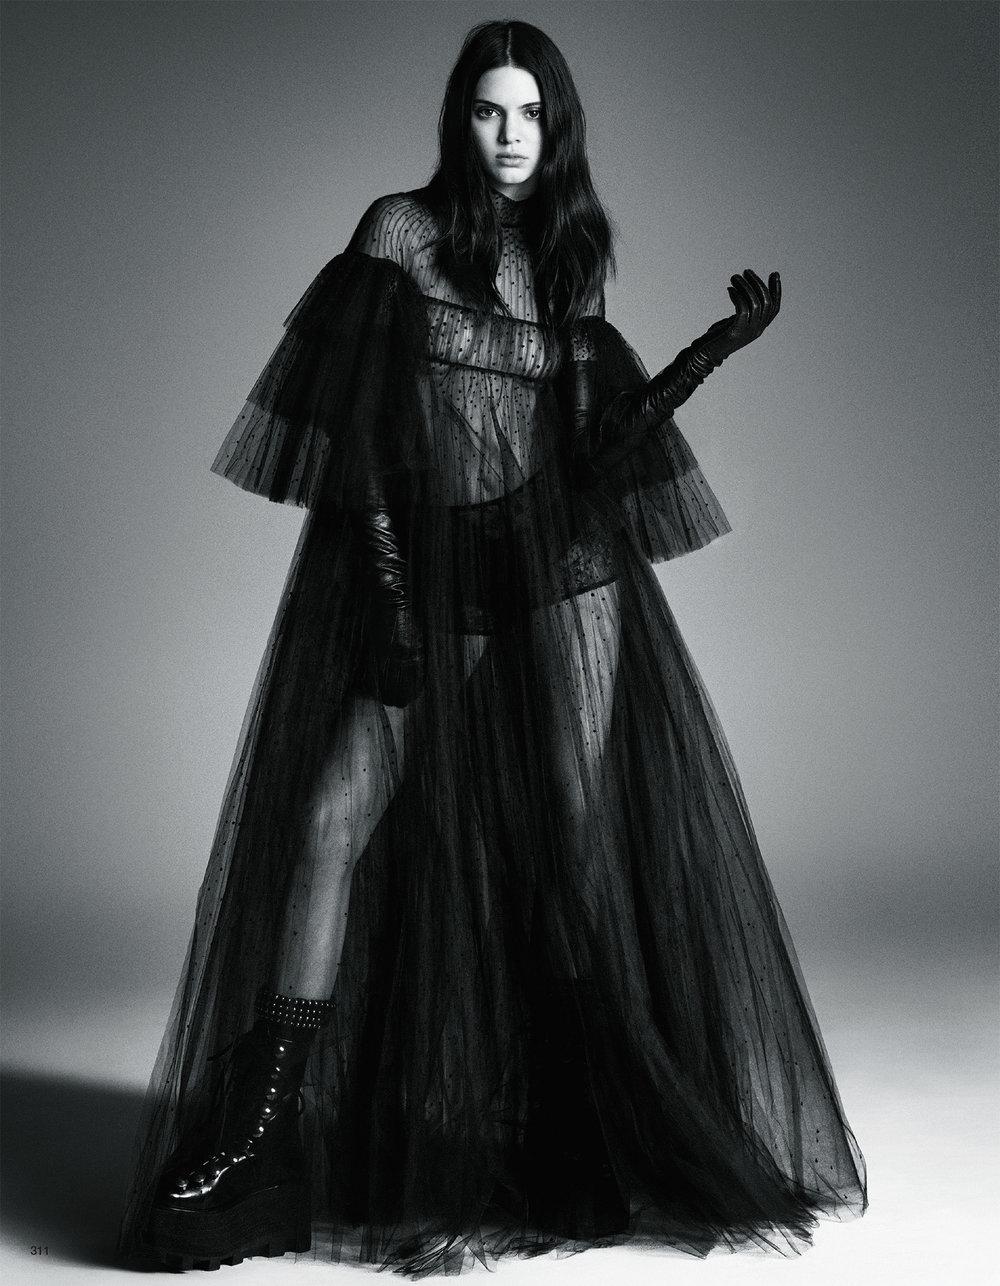 Giovanna-Battaglia-Vogue-Japan-November-2015-Cool-As-Kendall-Patrick-Demarchelier-Kendall-Jenner-7.jpg